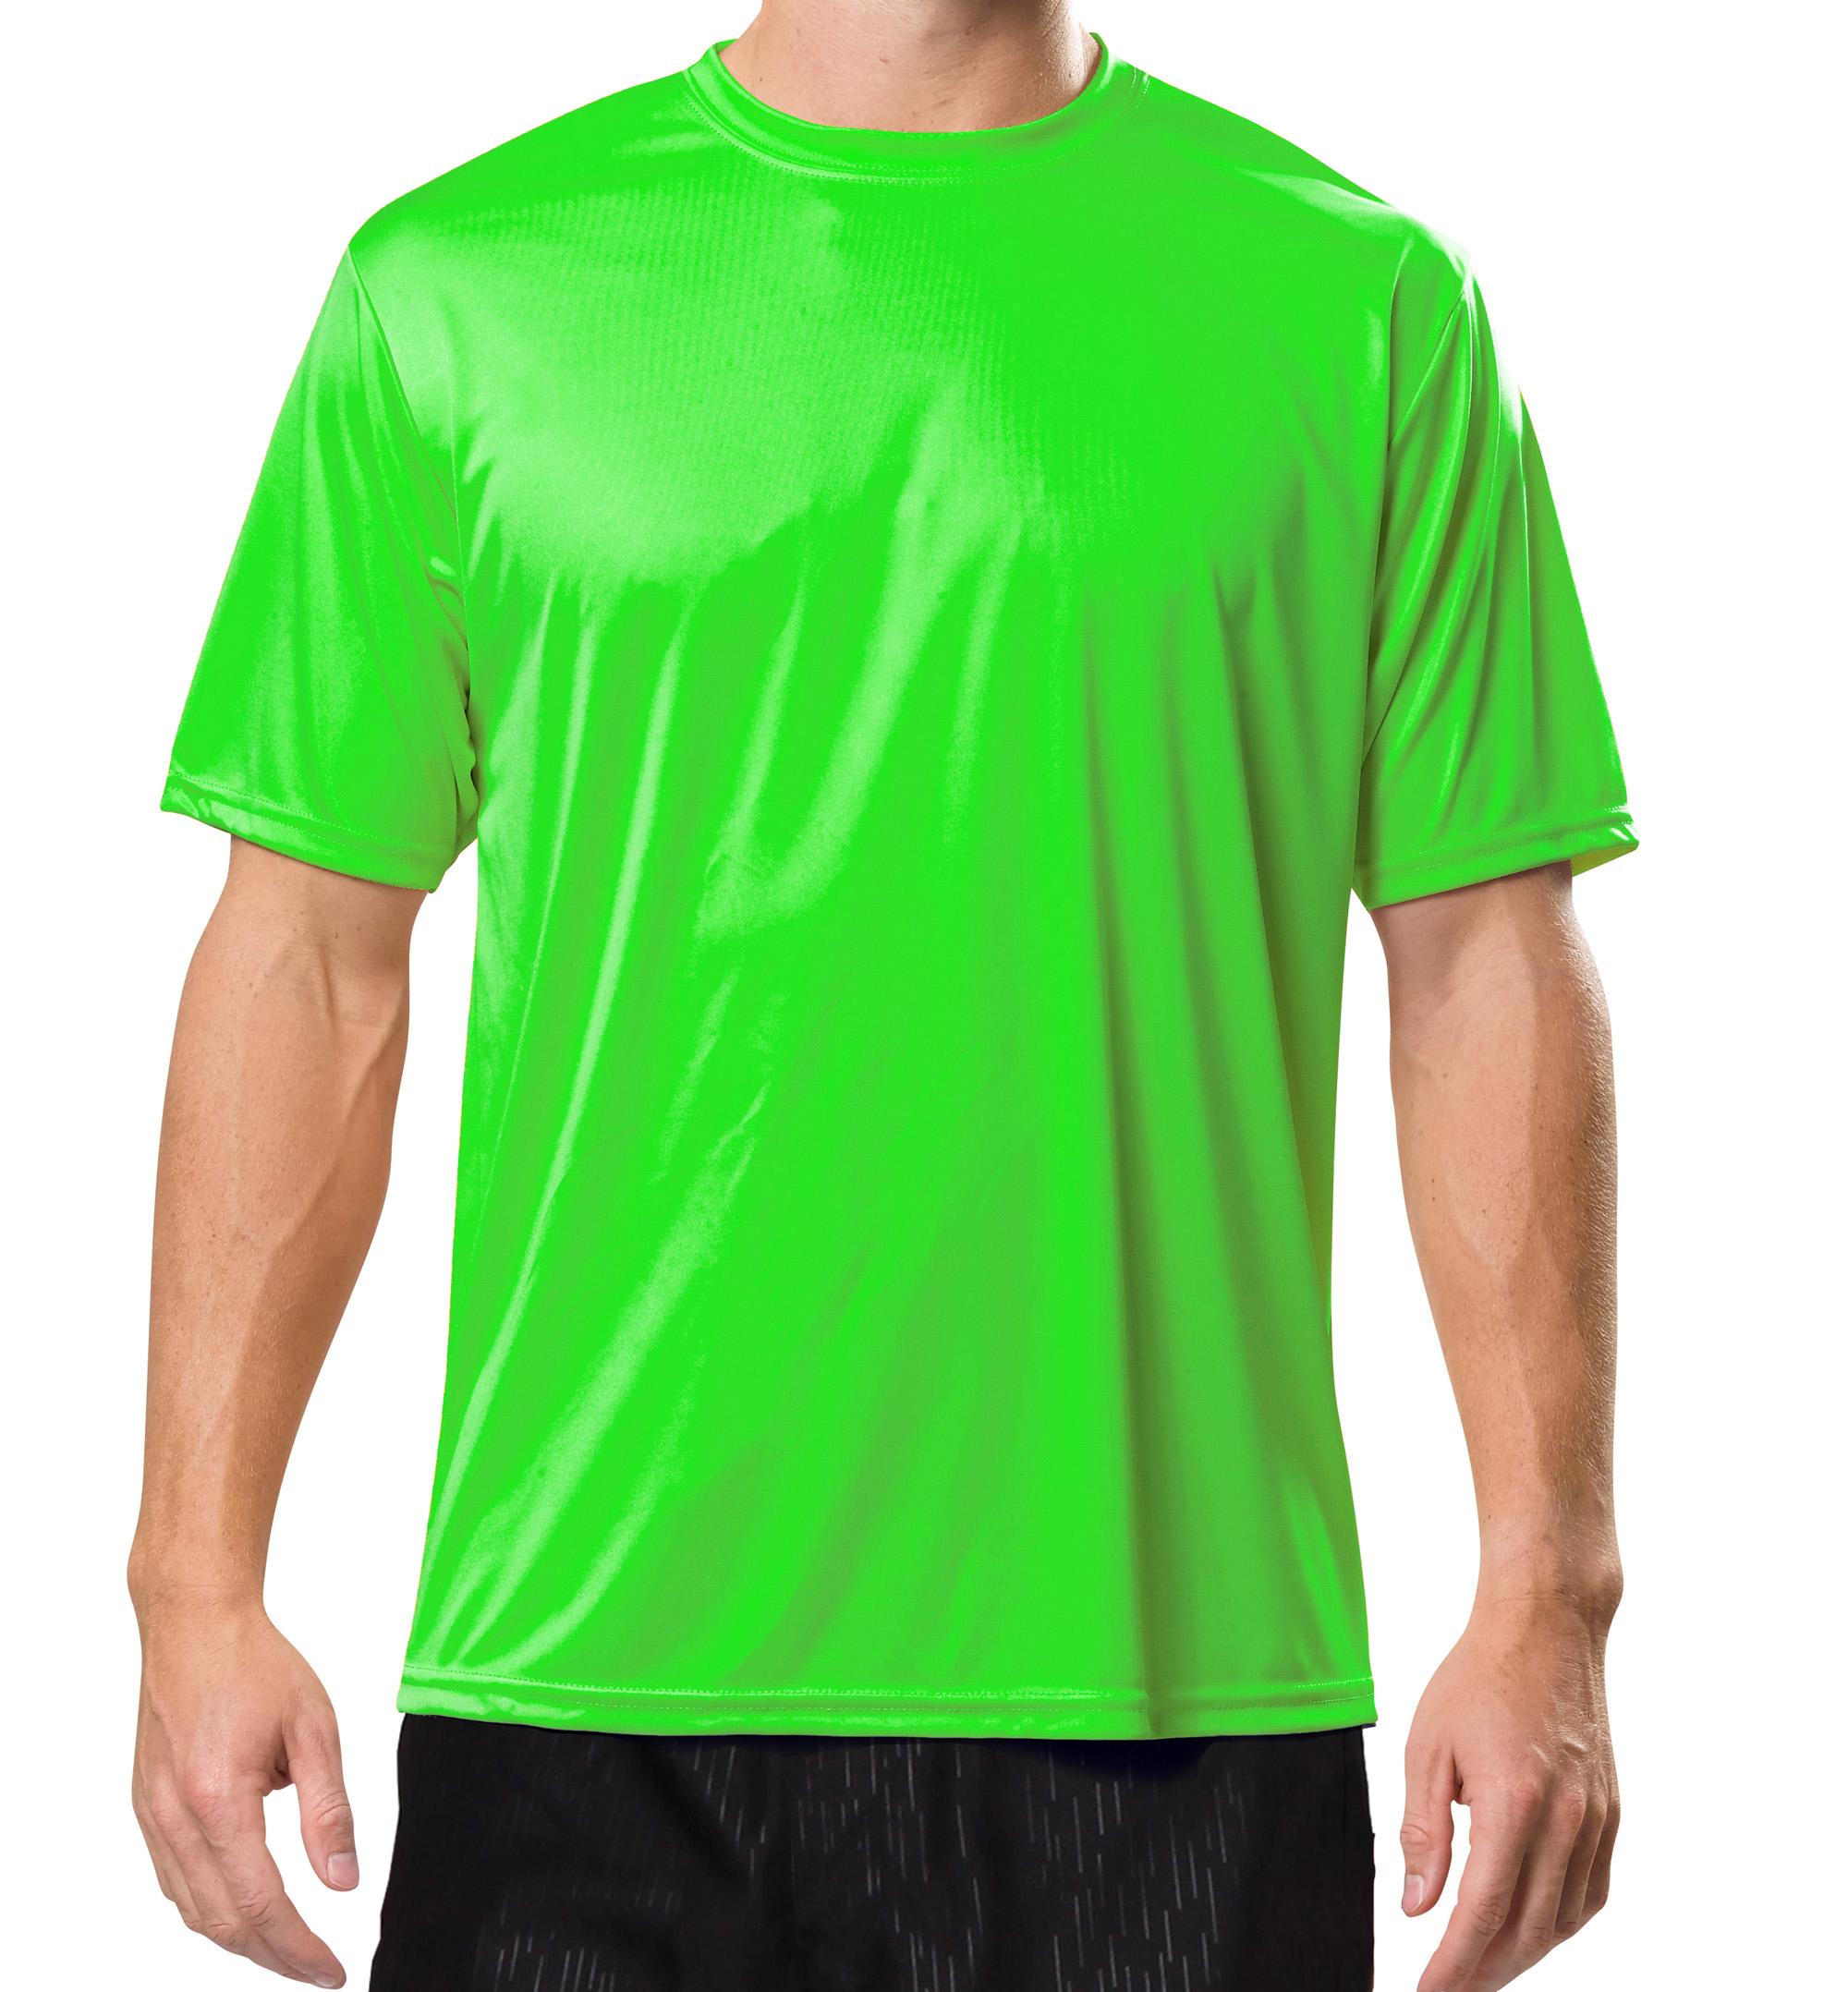 Mens-Rash-Guard-Surf-Swimwear-Swim-Shirt-SPF-Sun-Protection-Loose-Fit-Fitting thumbnail 23